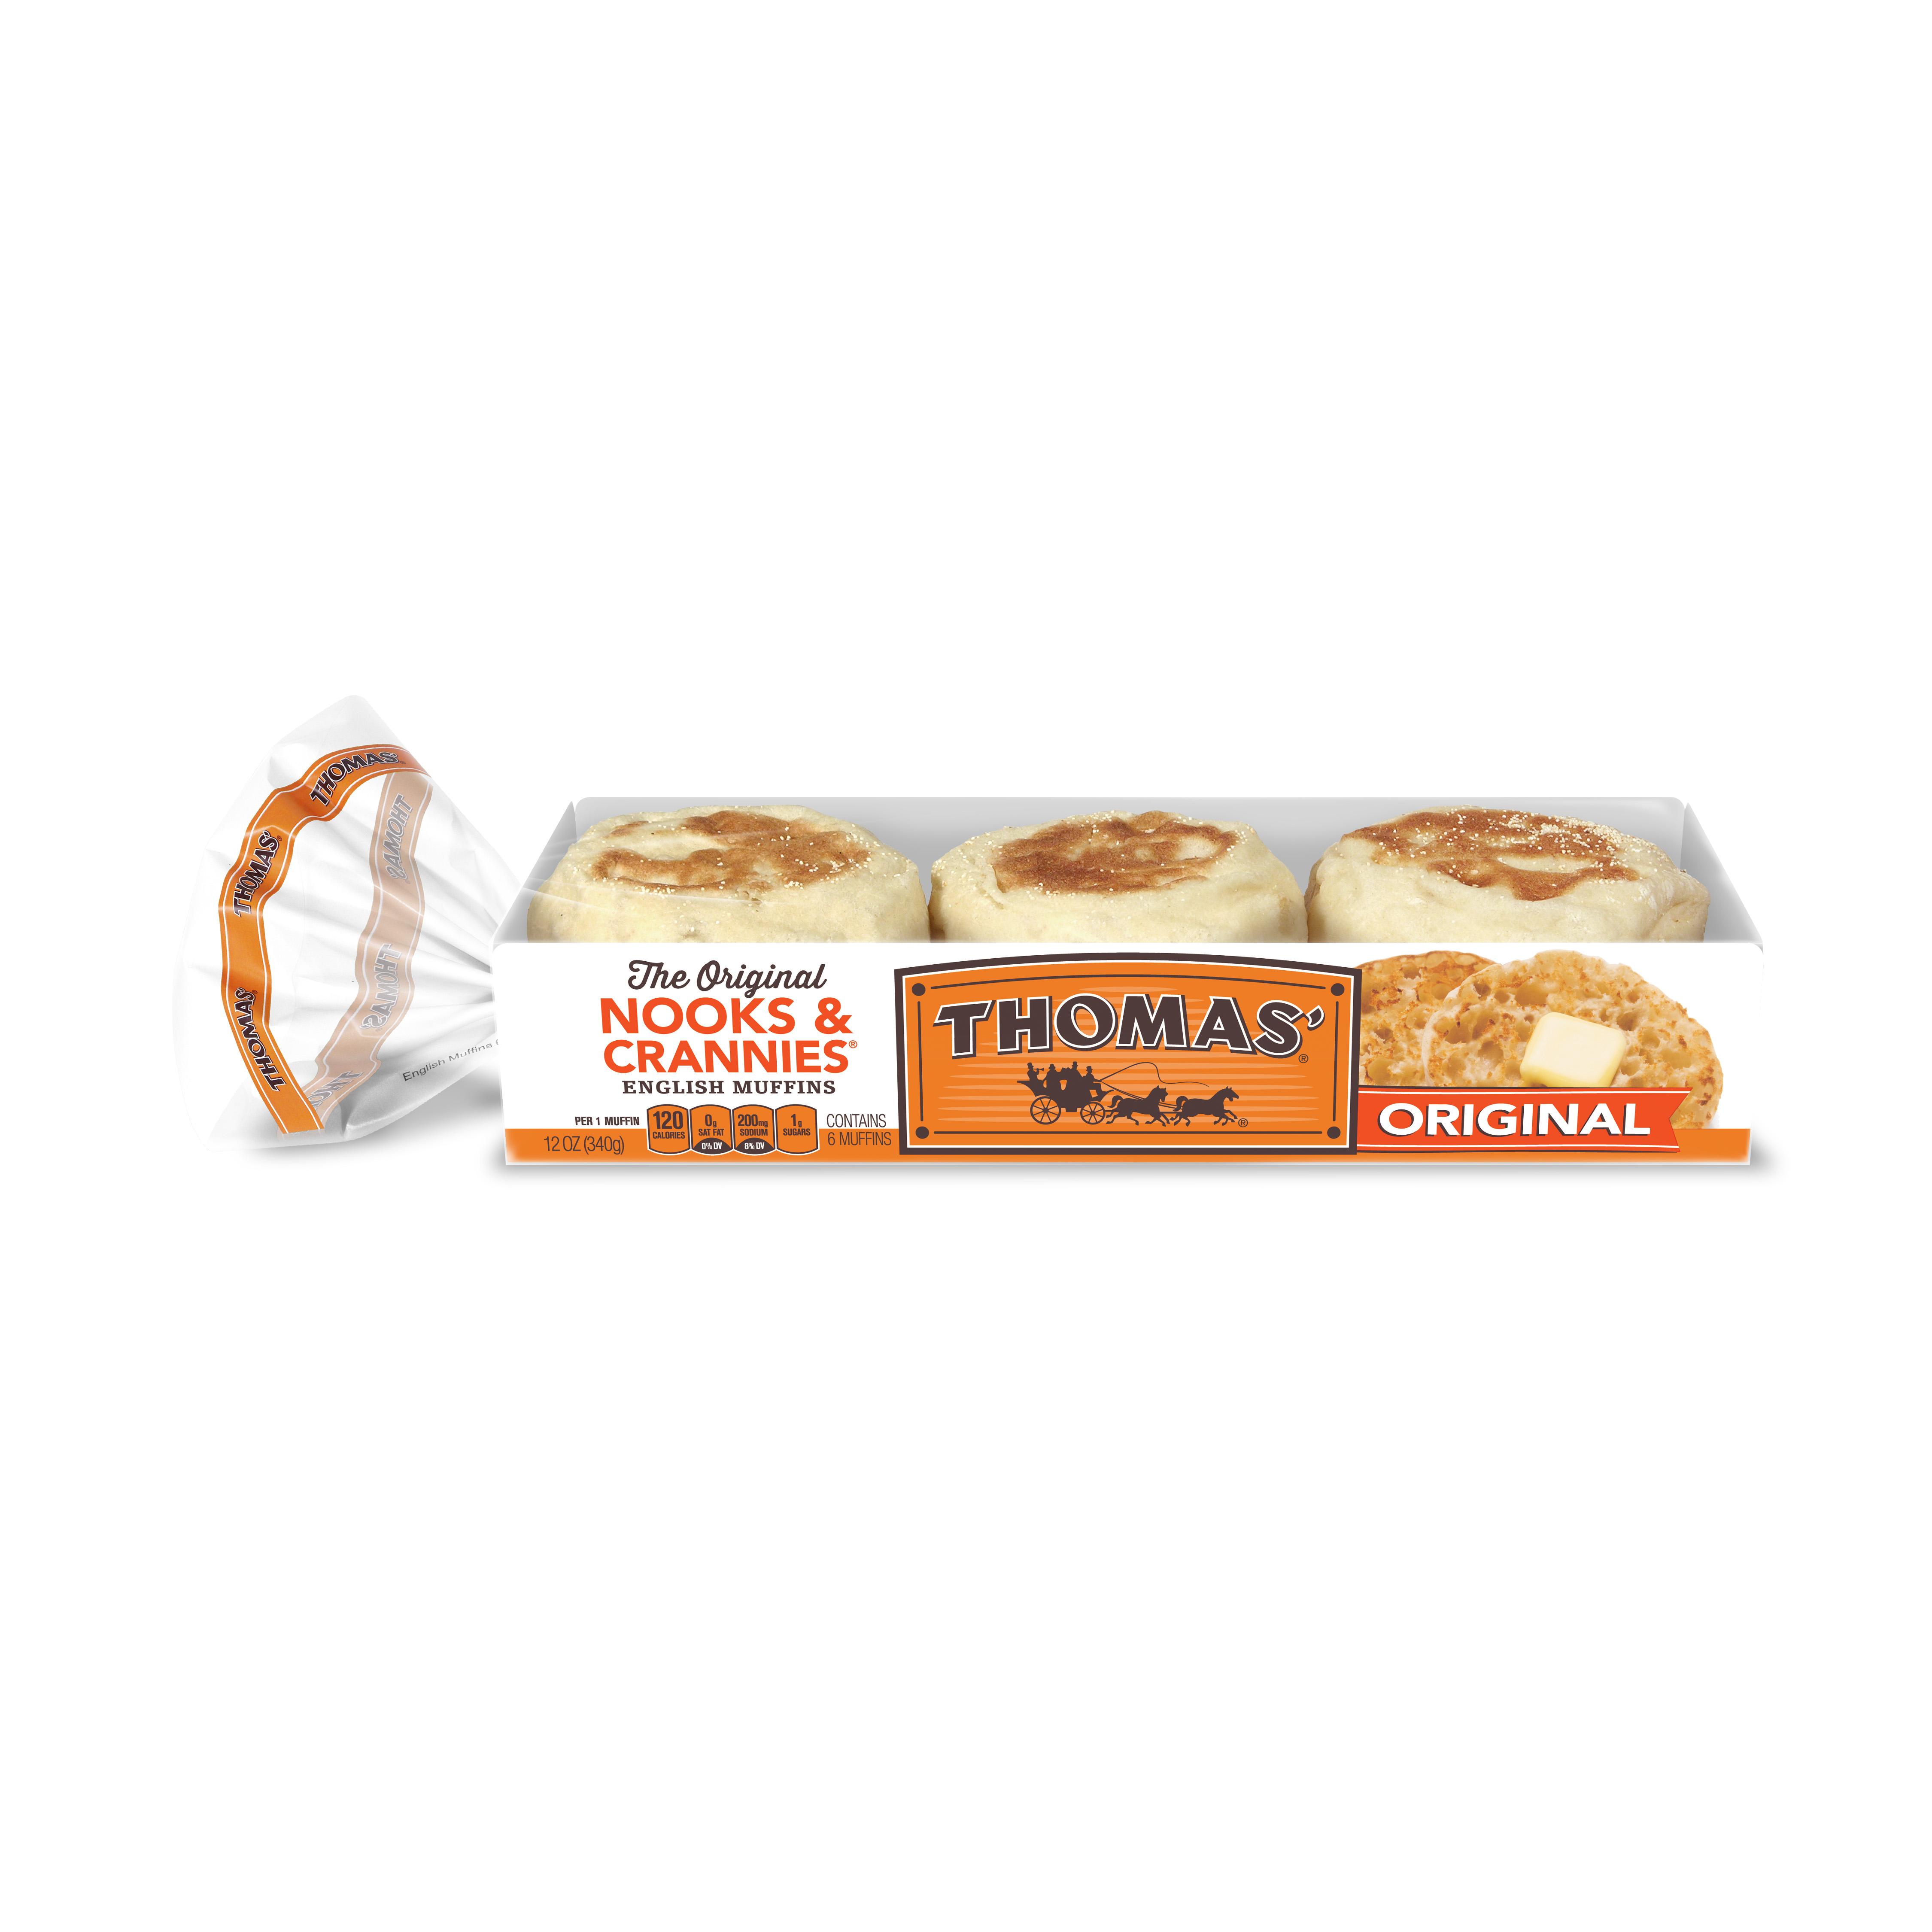 Thomas' Original English Muffin 6 pack 12 oz